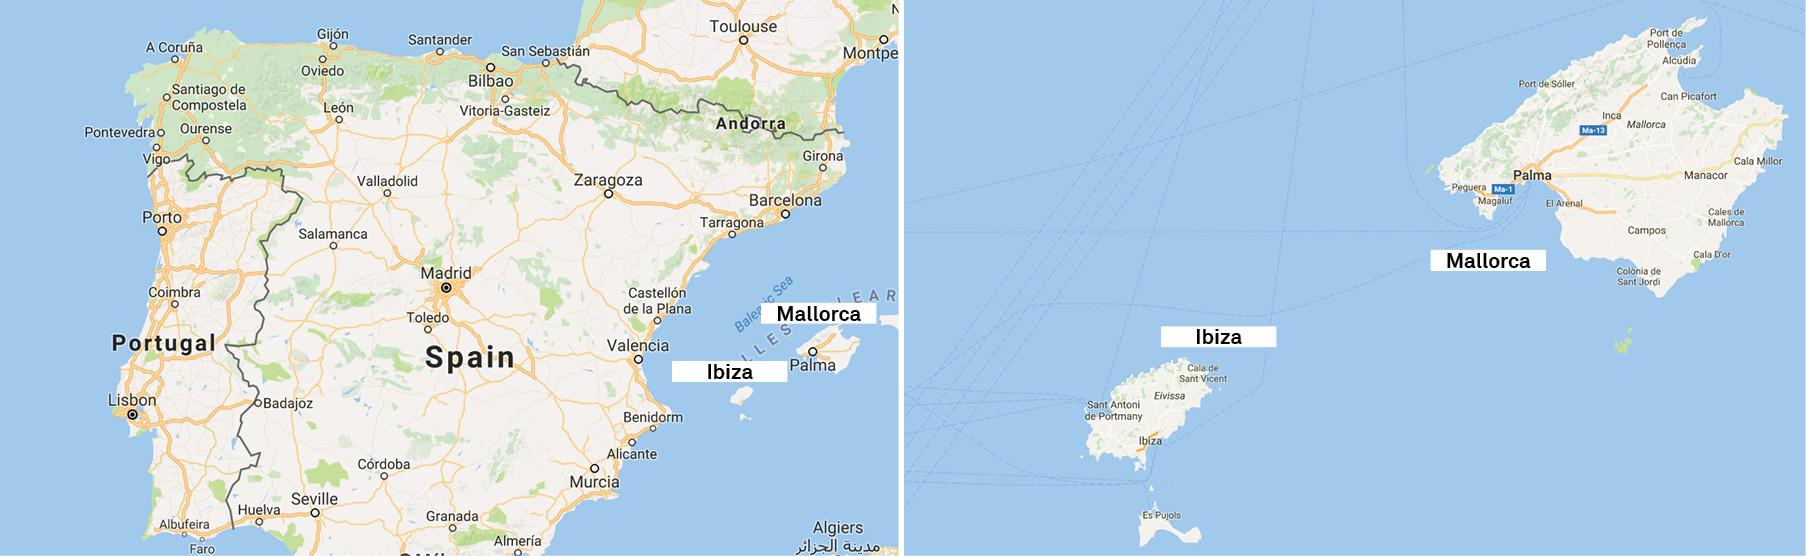 Map-Ibiza-Mallorca-Spain